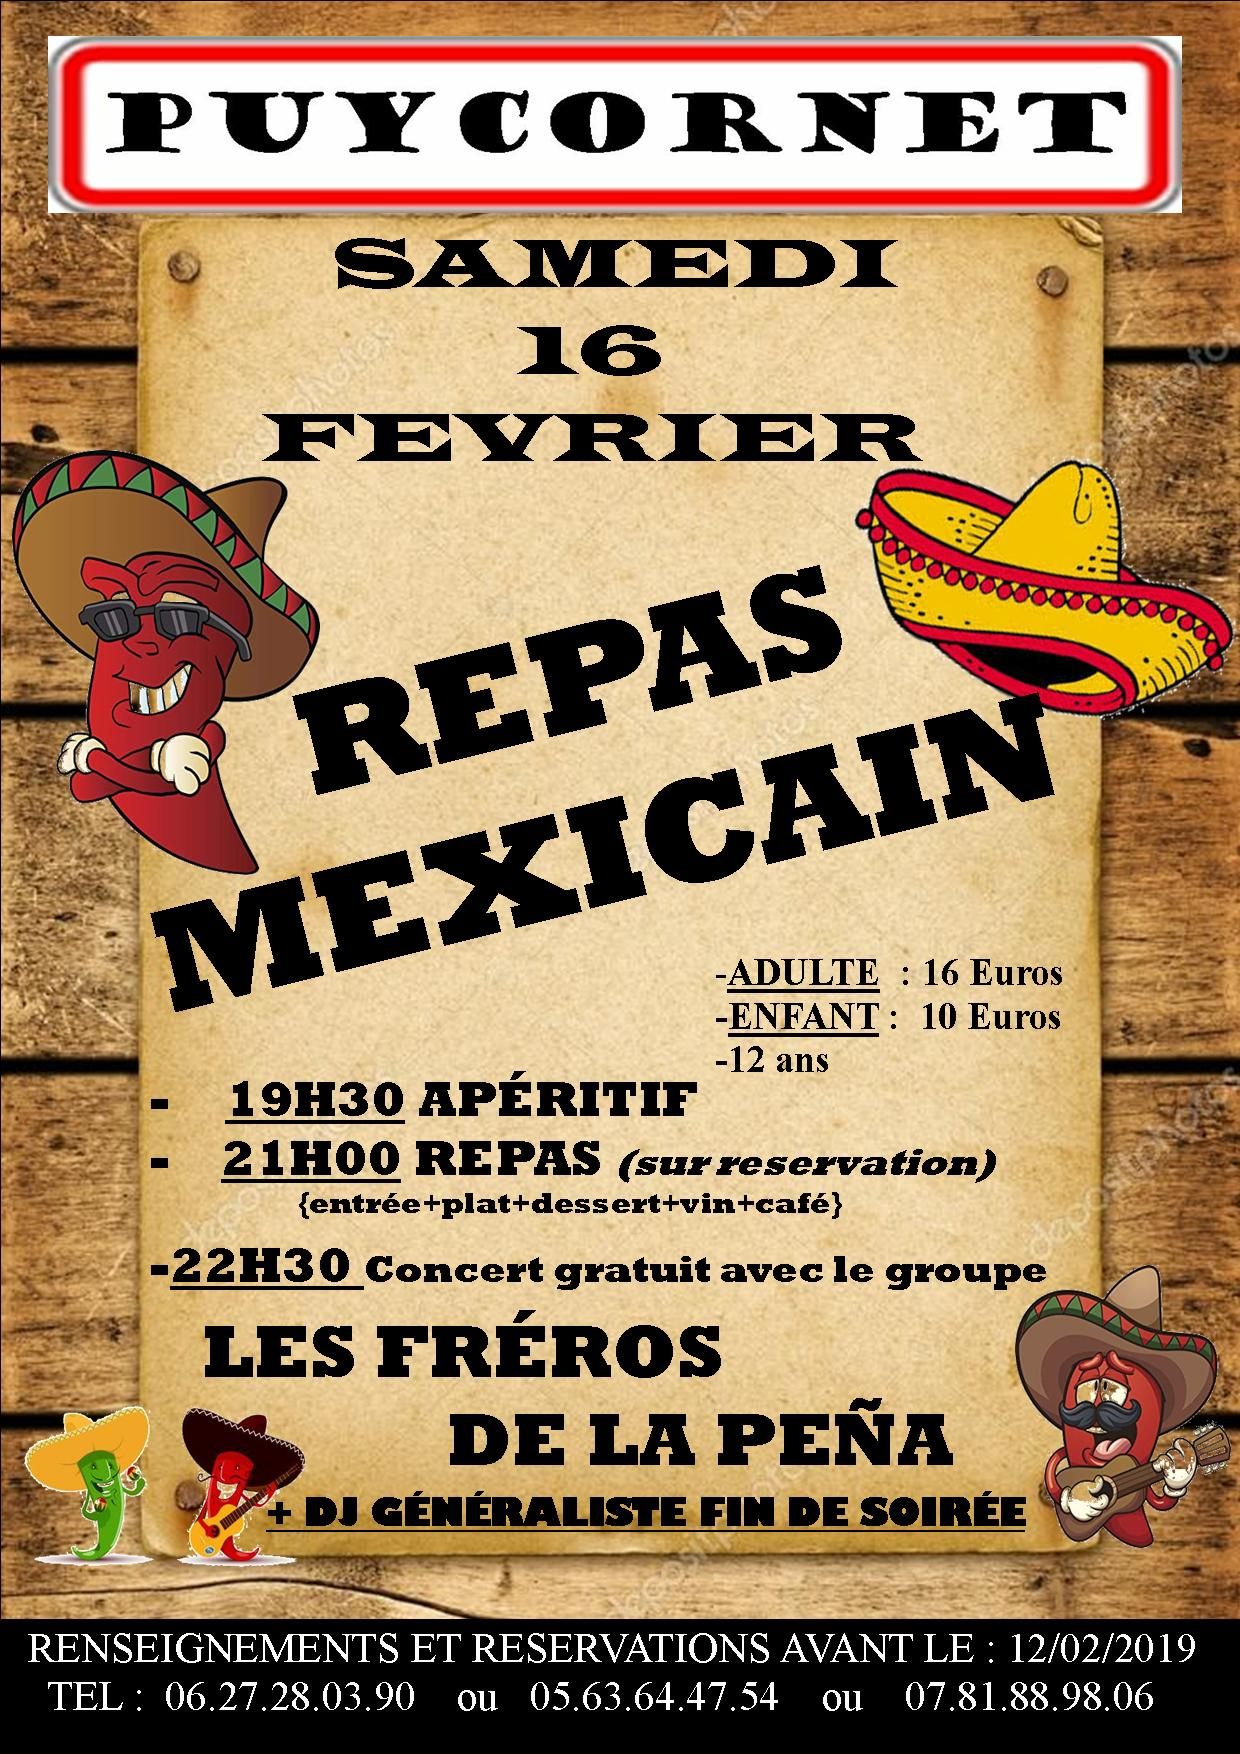 repas mexicain 2019